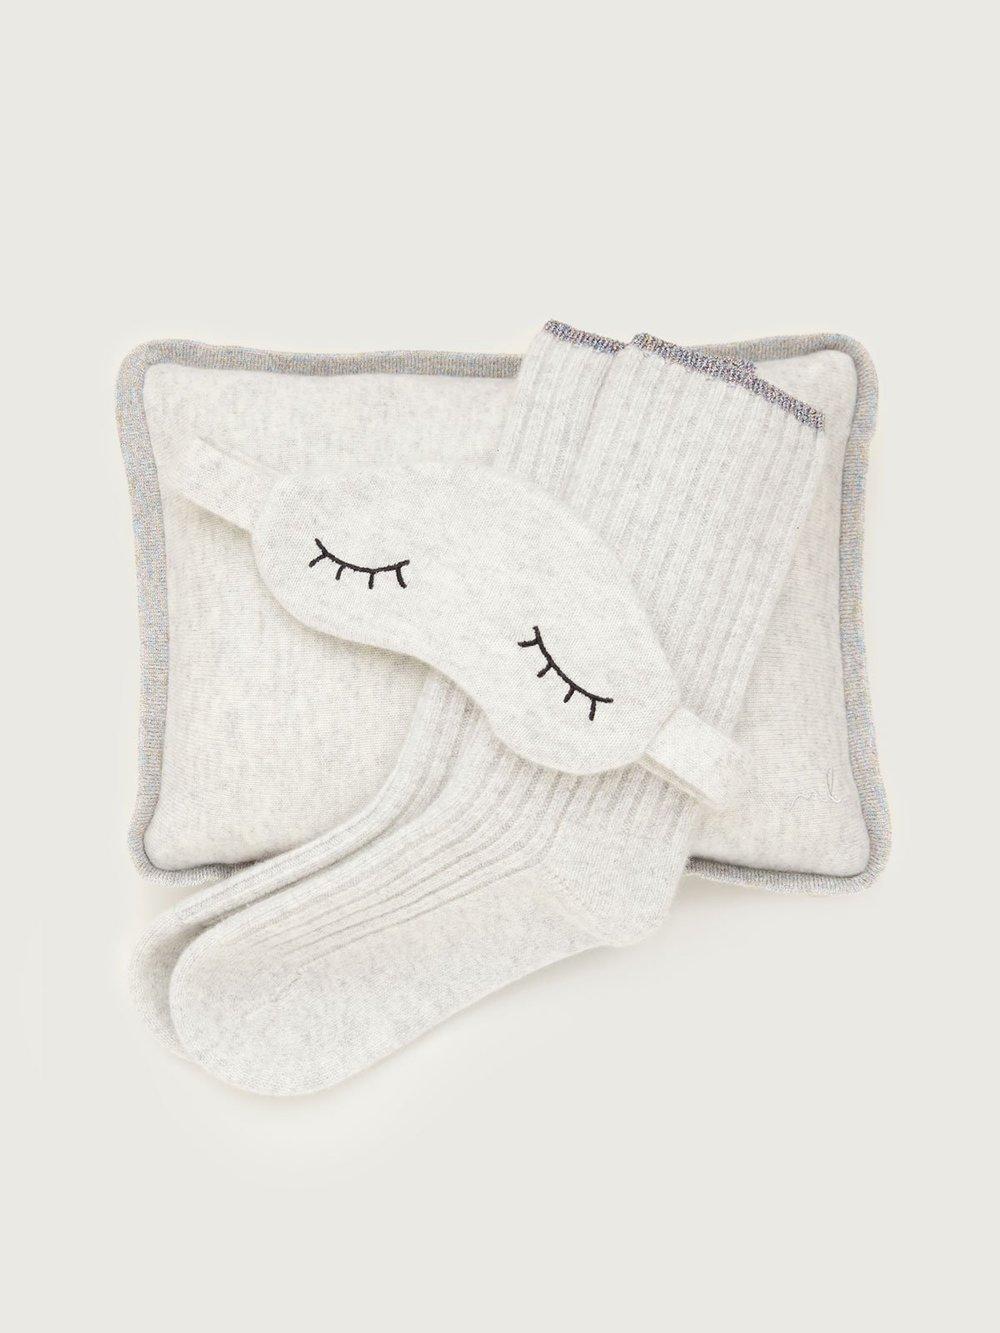 Wellness Gift Idea 2018 - Jetsetters - Morgan Lane - Sleepy Cashmere Gift Set.jpg